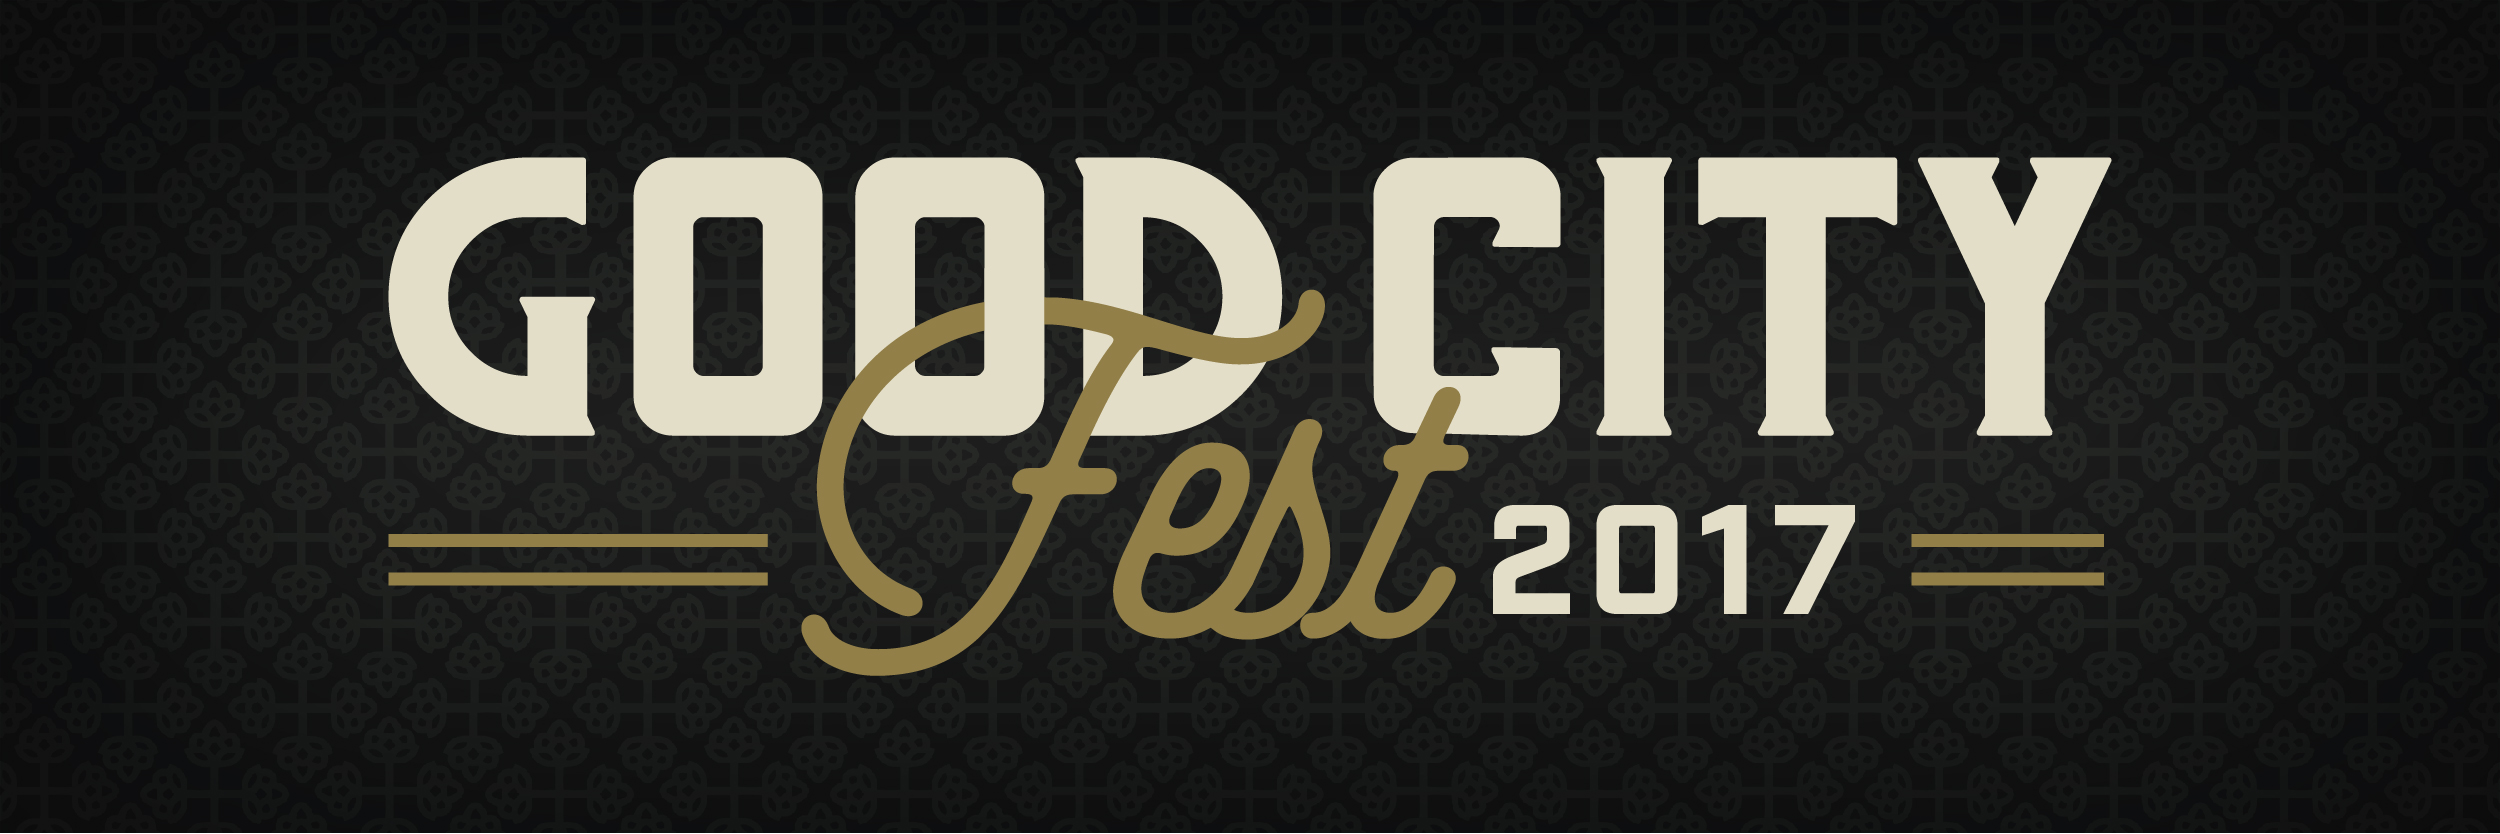 Good City Brewing Company Announces Good City Fest 2017